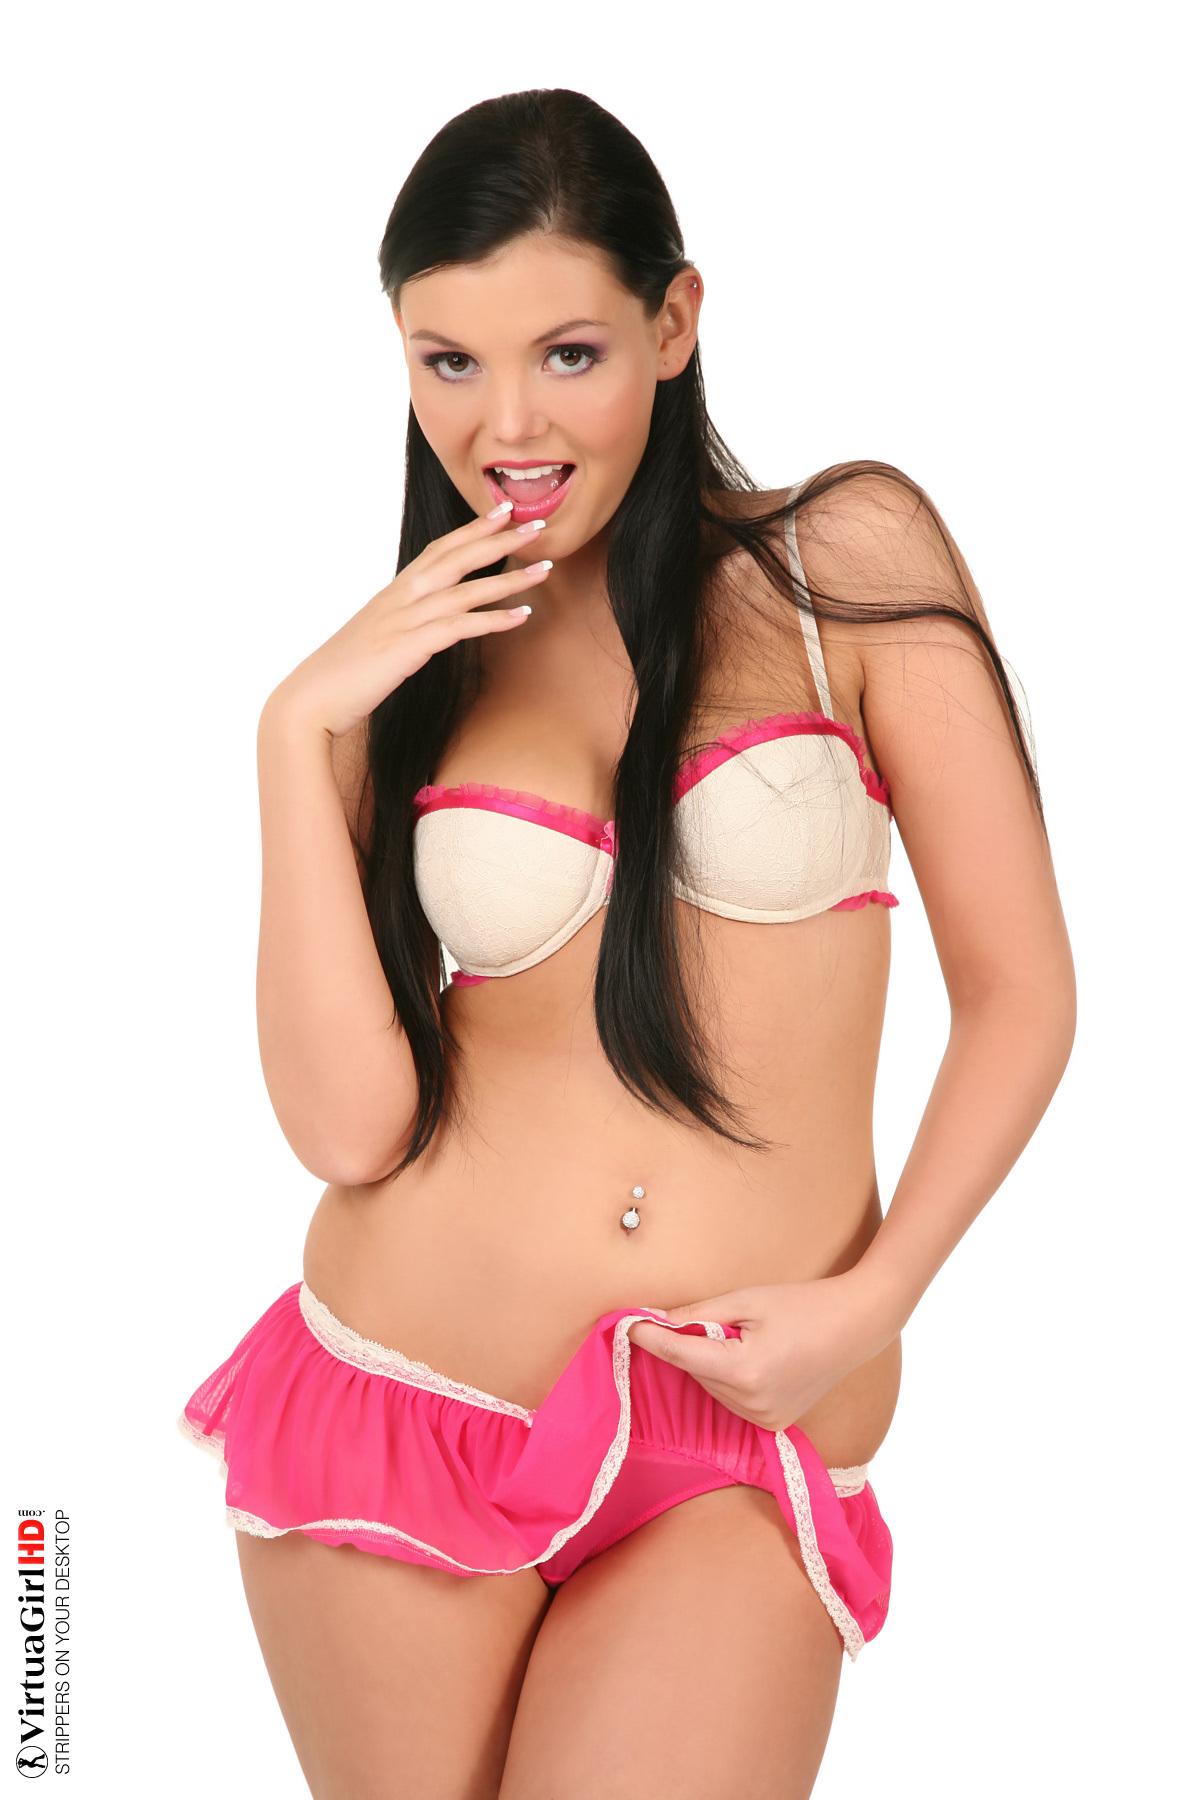 chubby girls stripping pornhub